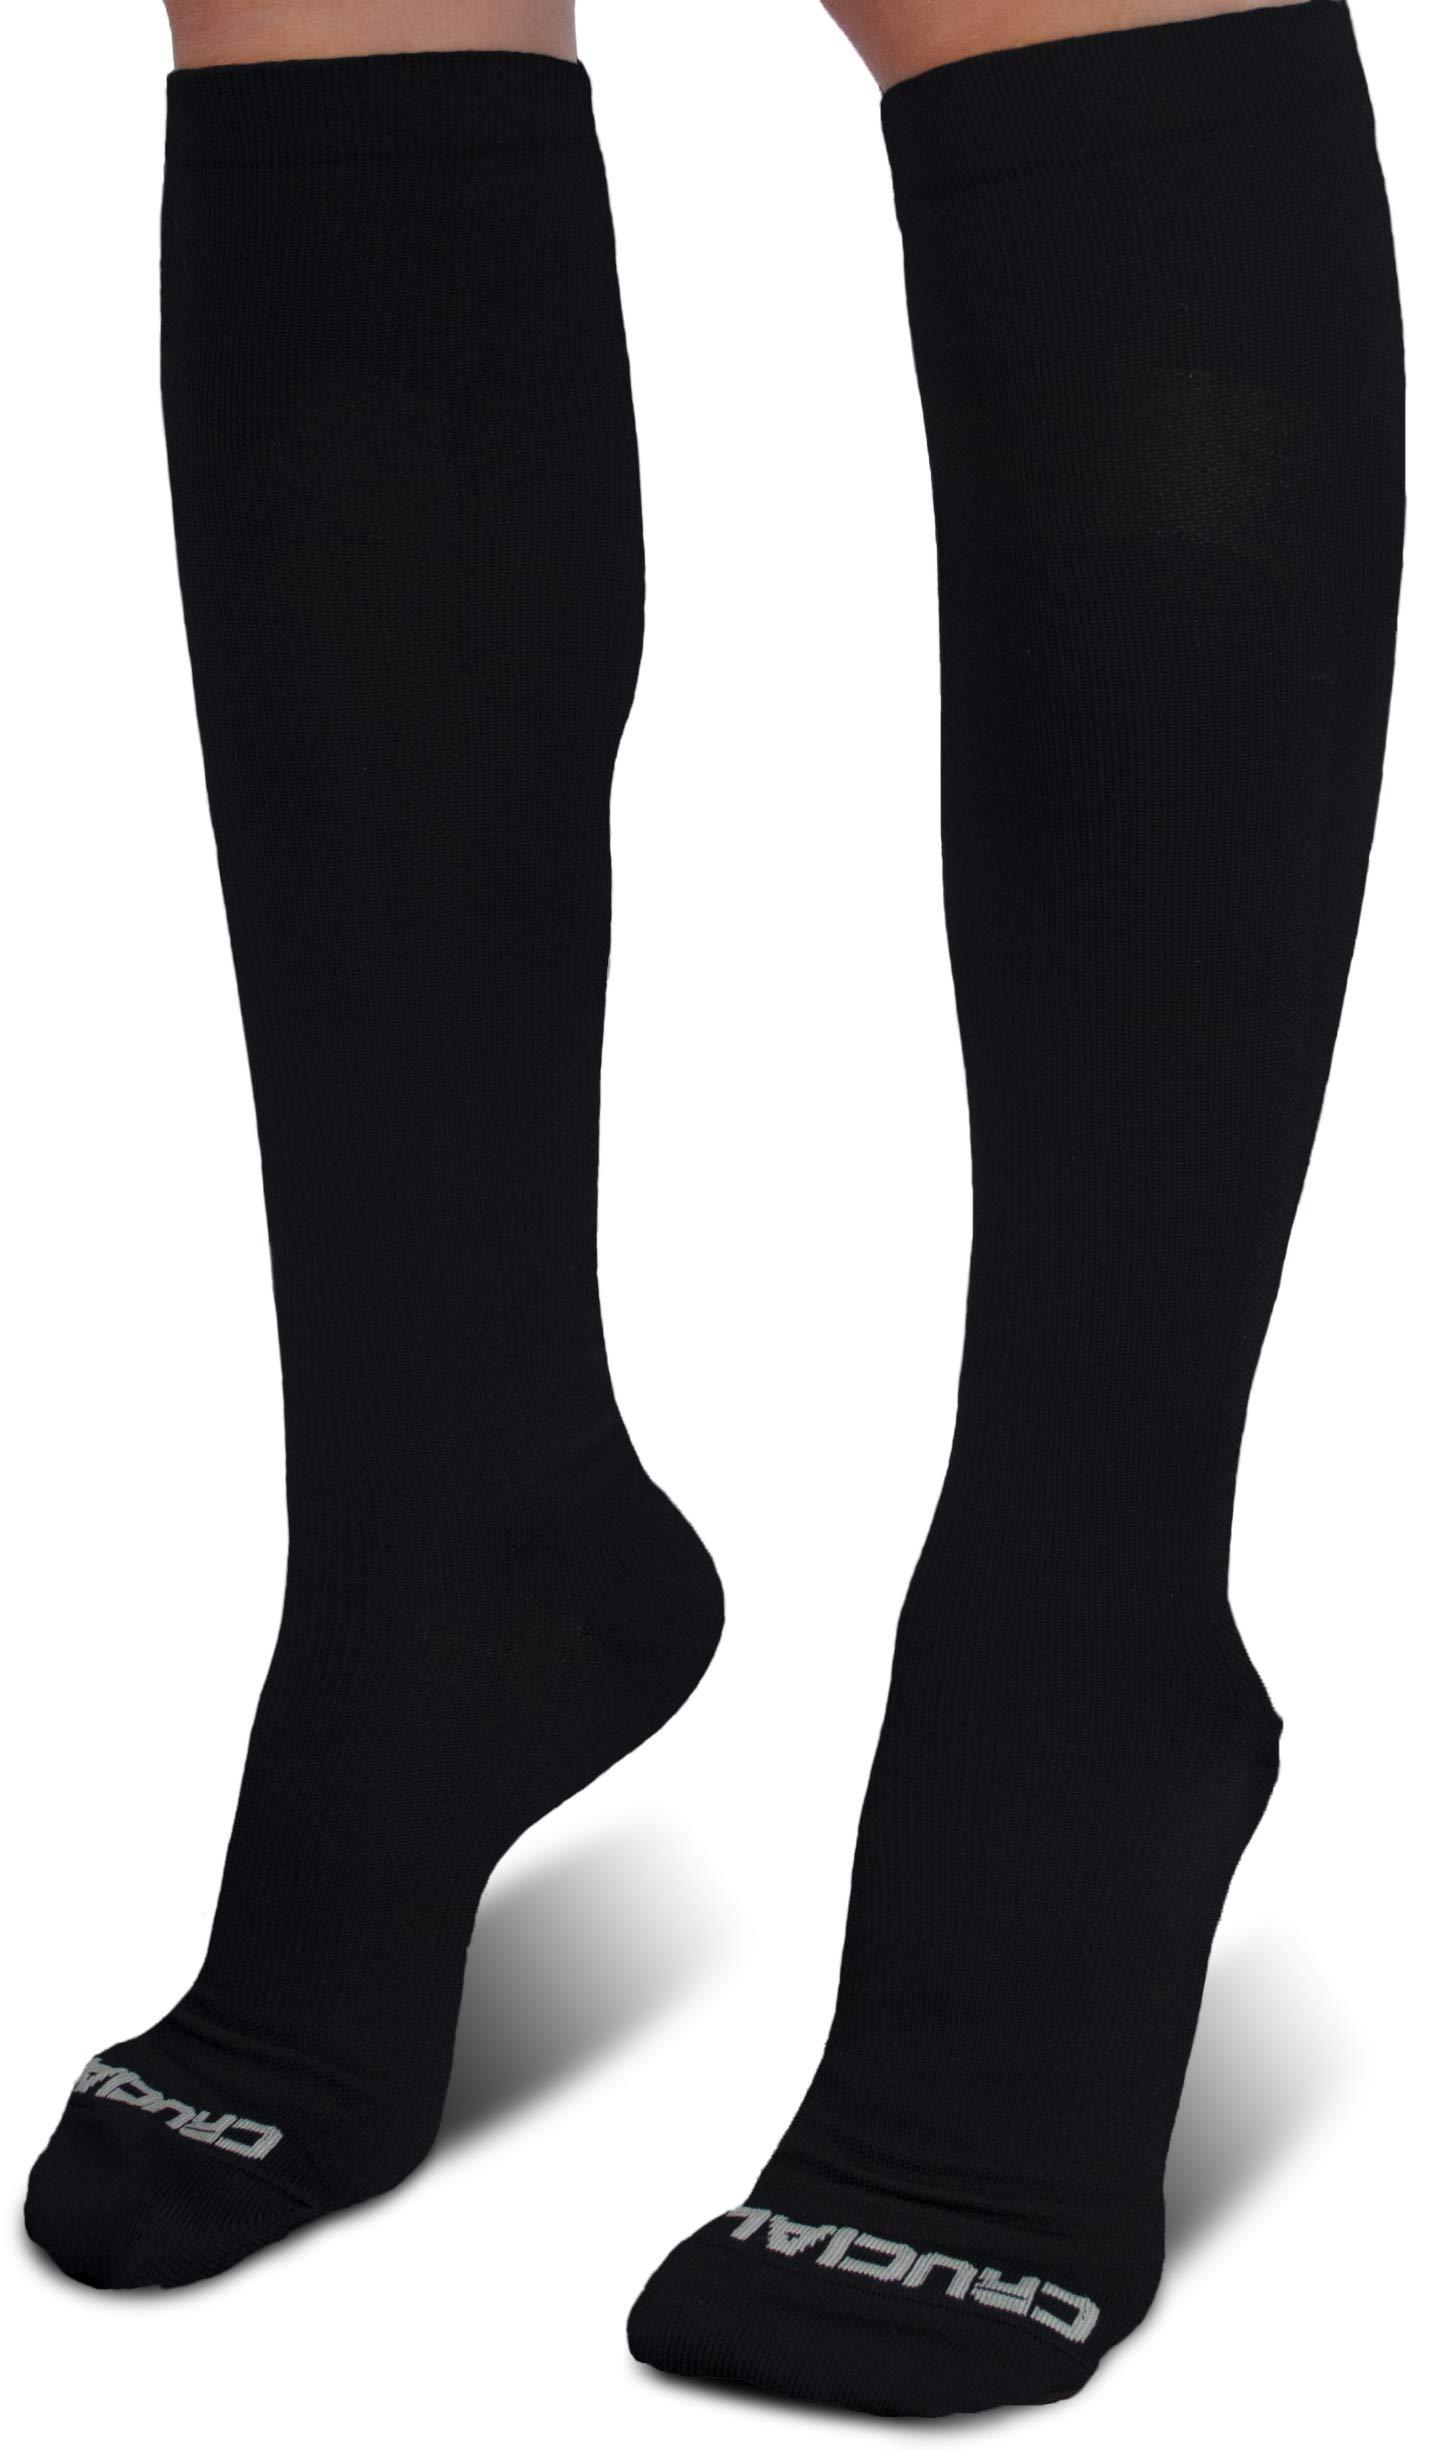 Pro Compression Socks for Men & Women (20-30mmHg) - Best Graduated Stockings for Running, Athletic, Stamina, Travel, Flight, Pregnancy, Maternity, Nursing, Medical (L/XL, Solid Black)